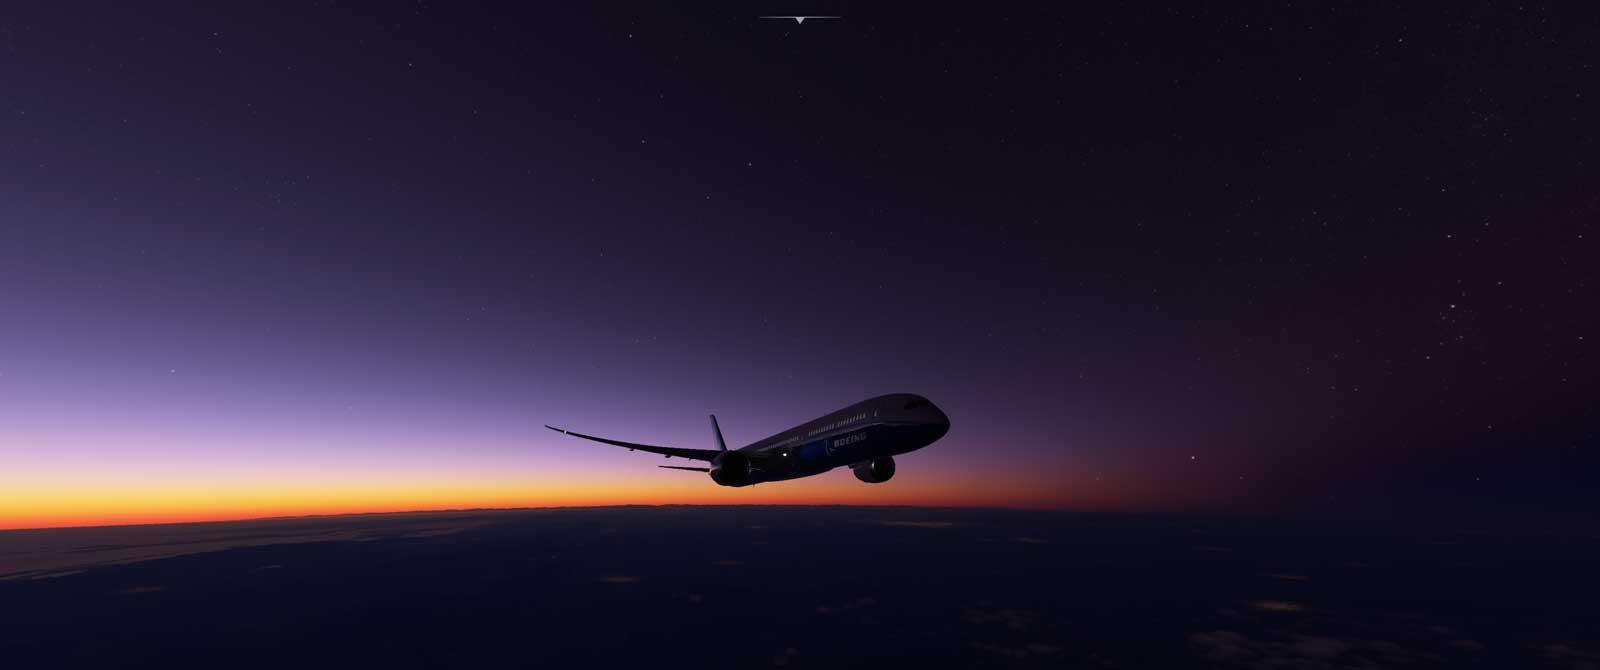 787-Nightfall-Dusk.jpg